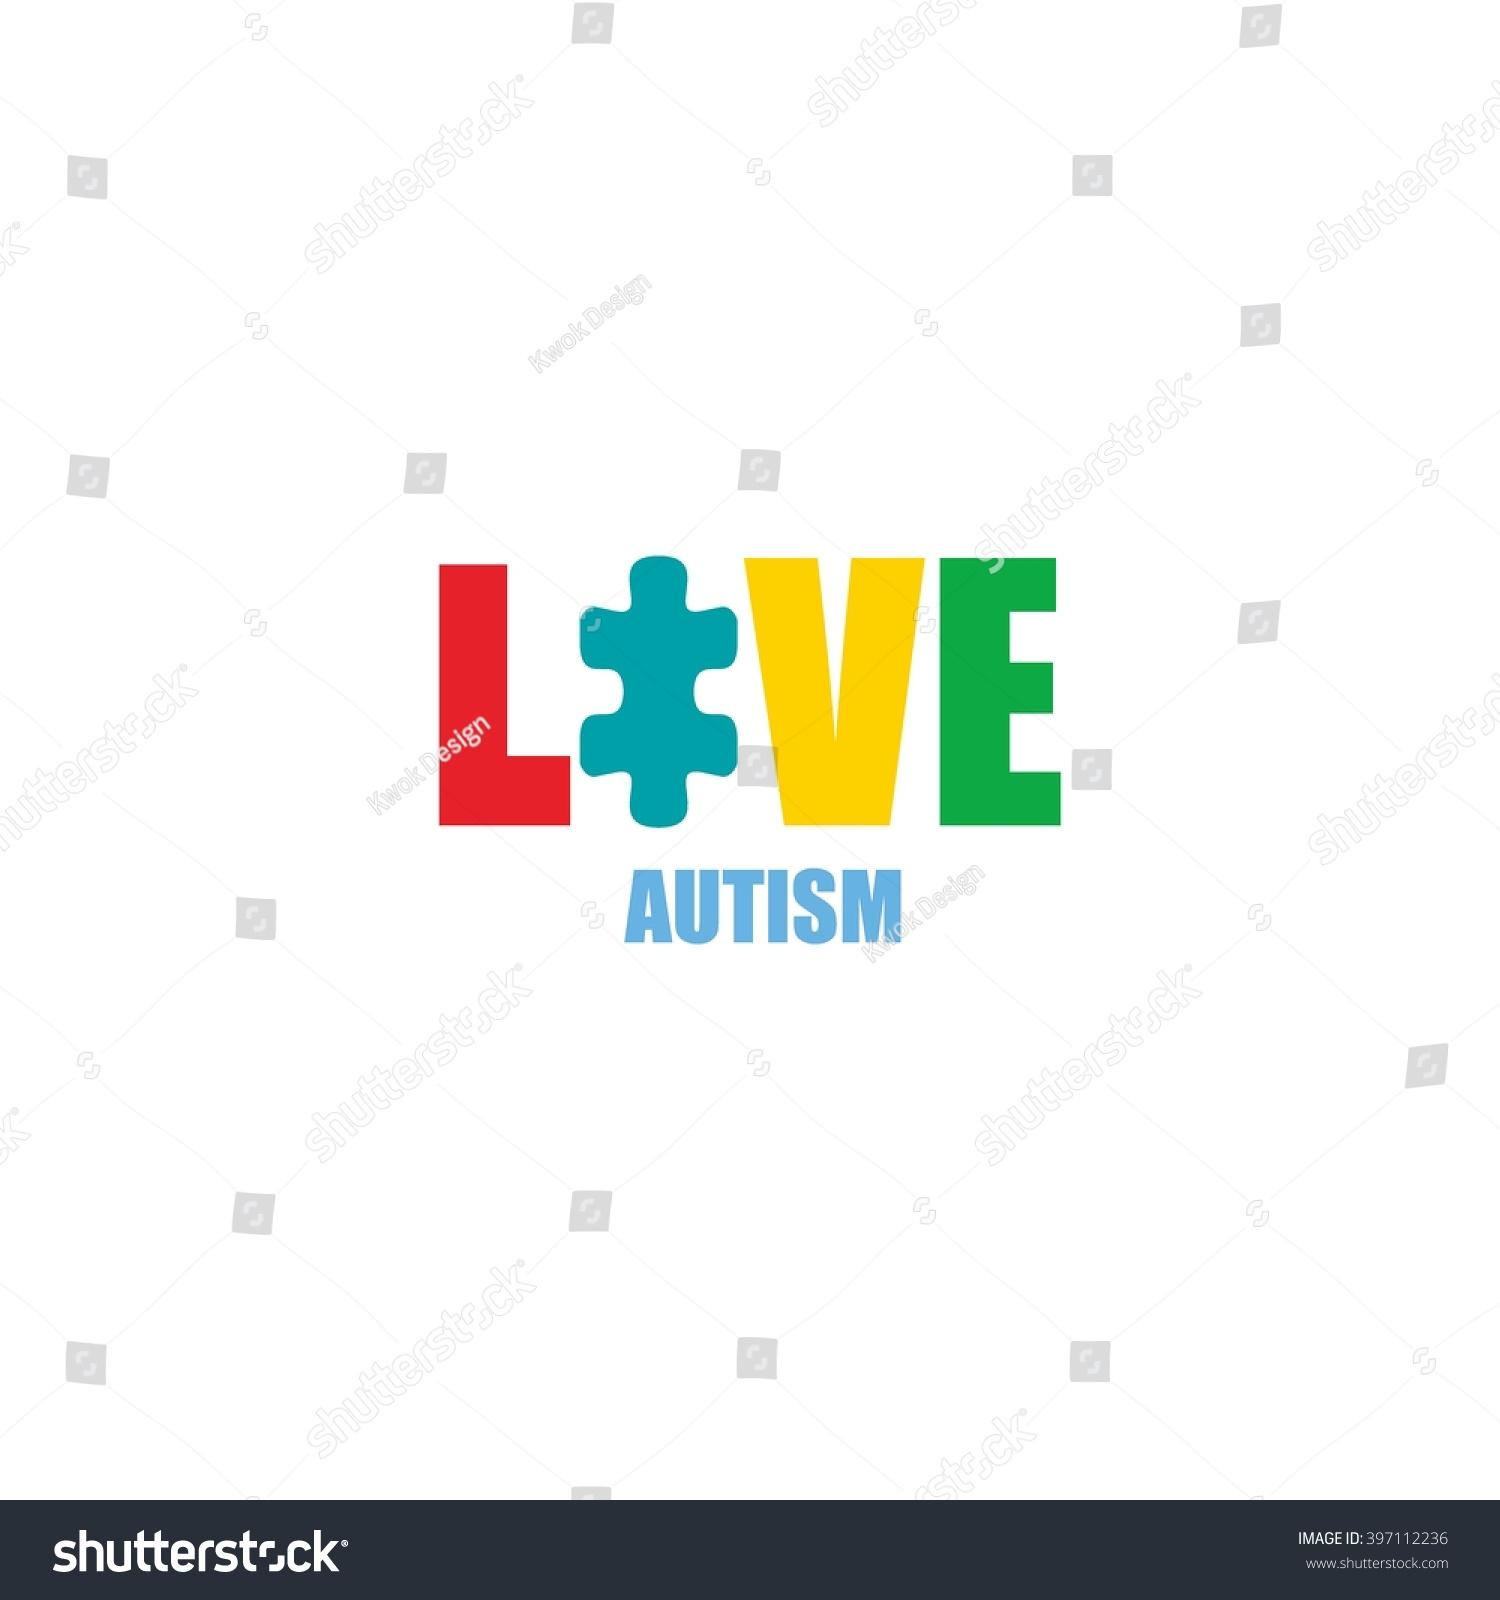 World autism awareness day logo design stock vector 397112236 world autism awareness day logo design template vector illustration colorful puzzles symbol biocorpaavc